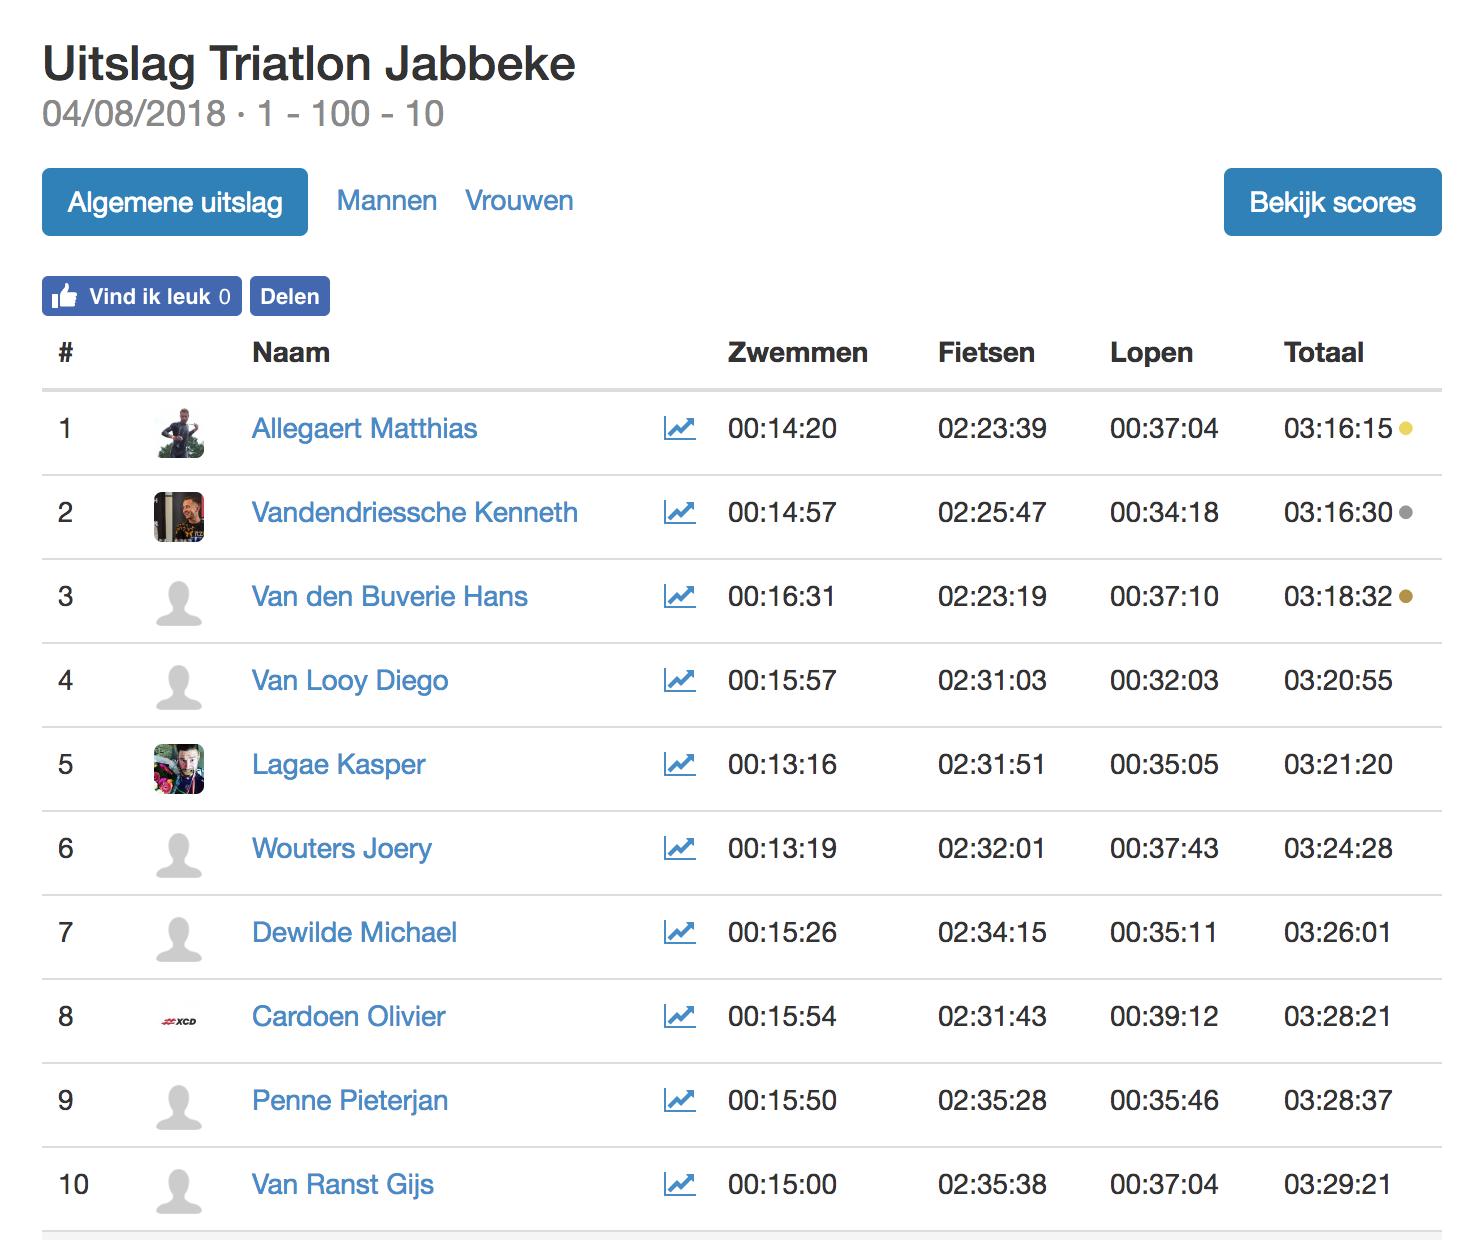 Triatlonwedstrijden be · Uitslag Triatlon Jabbeke 2018